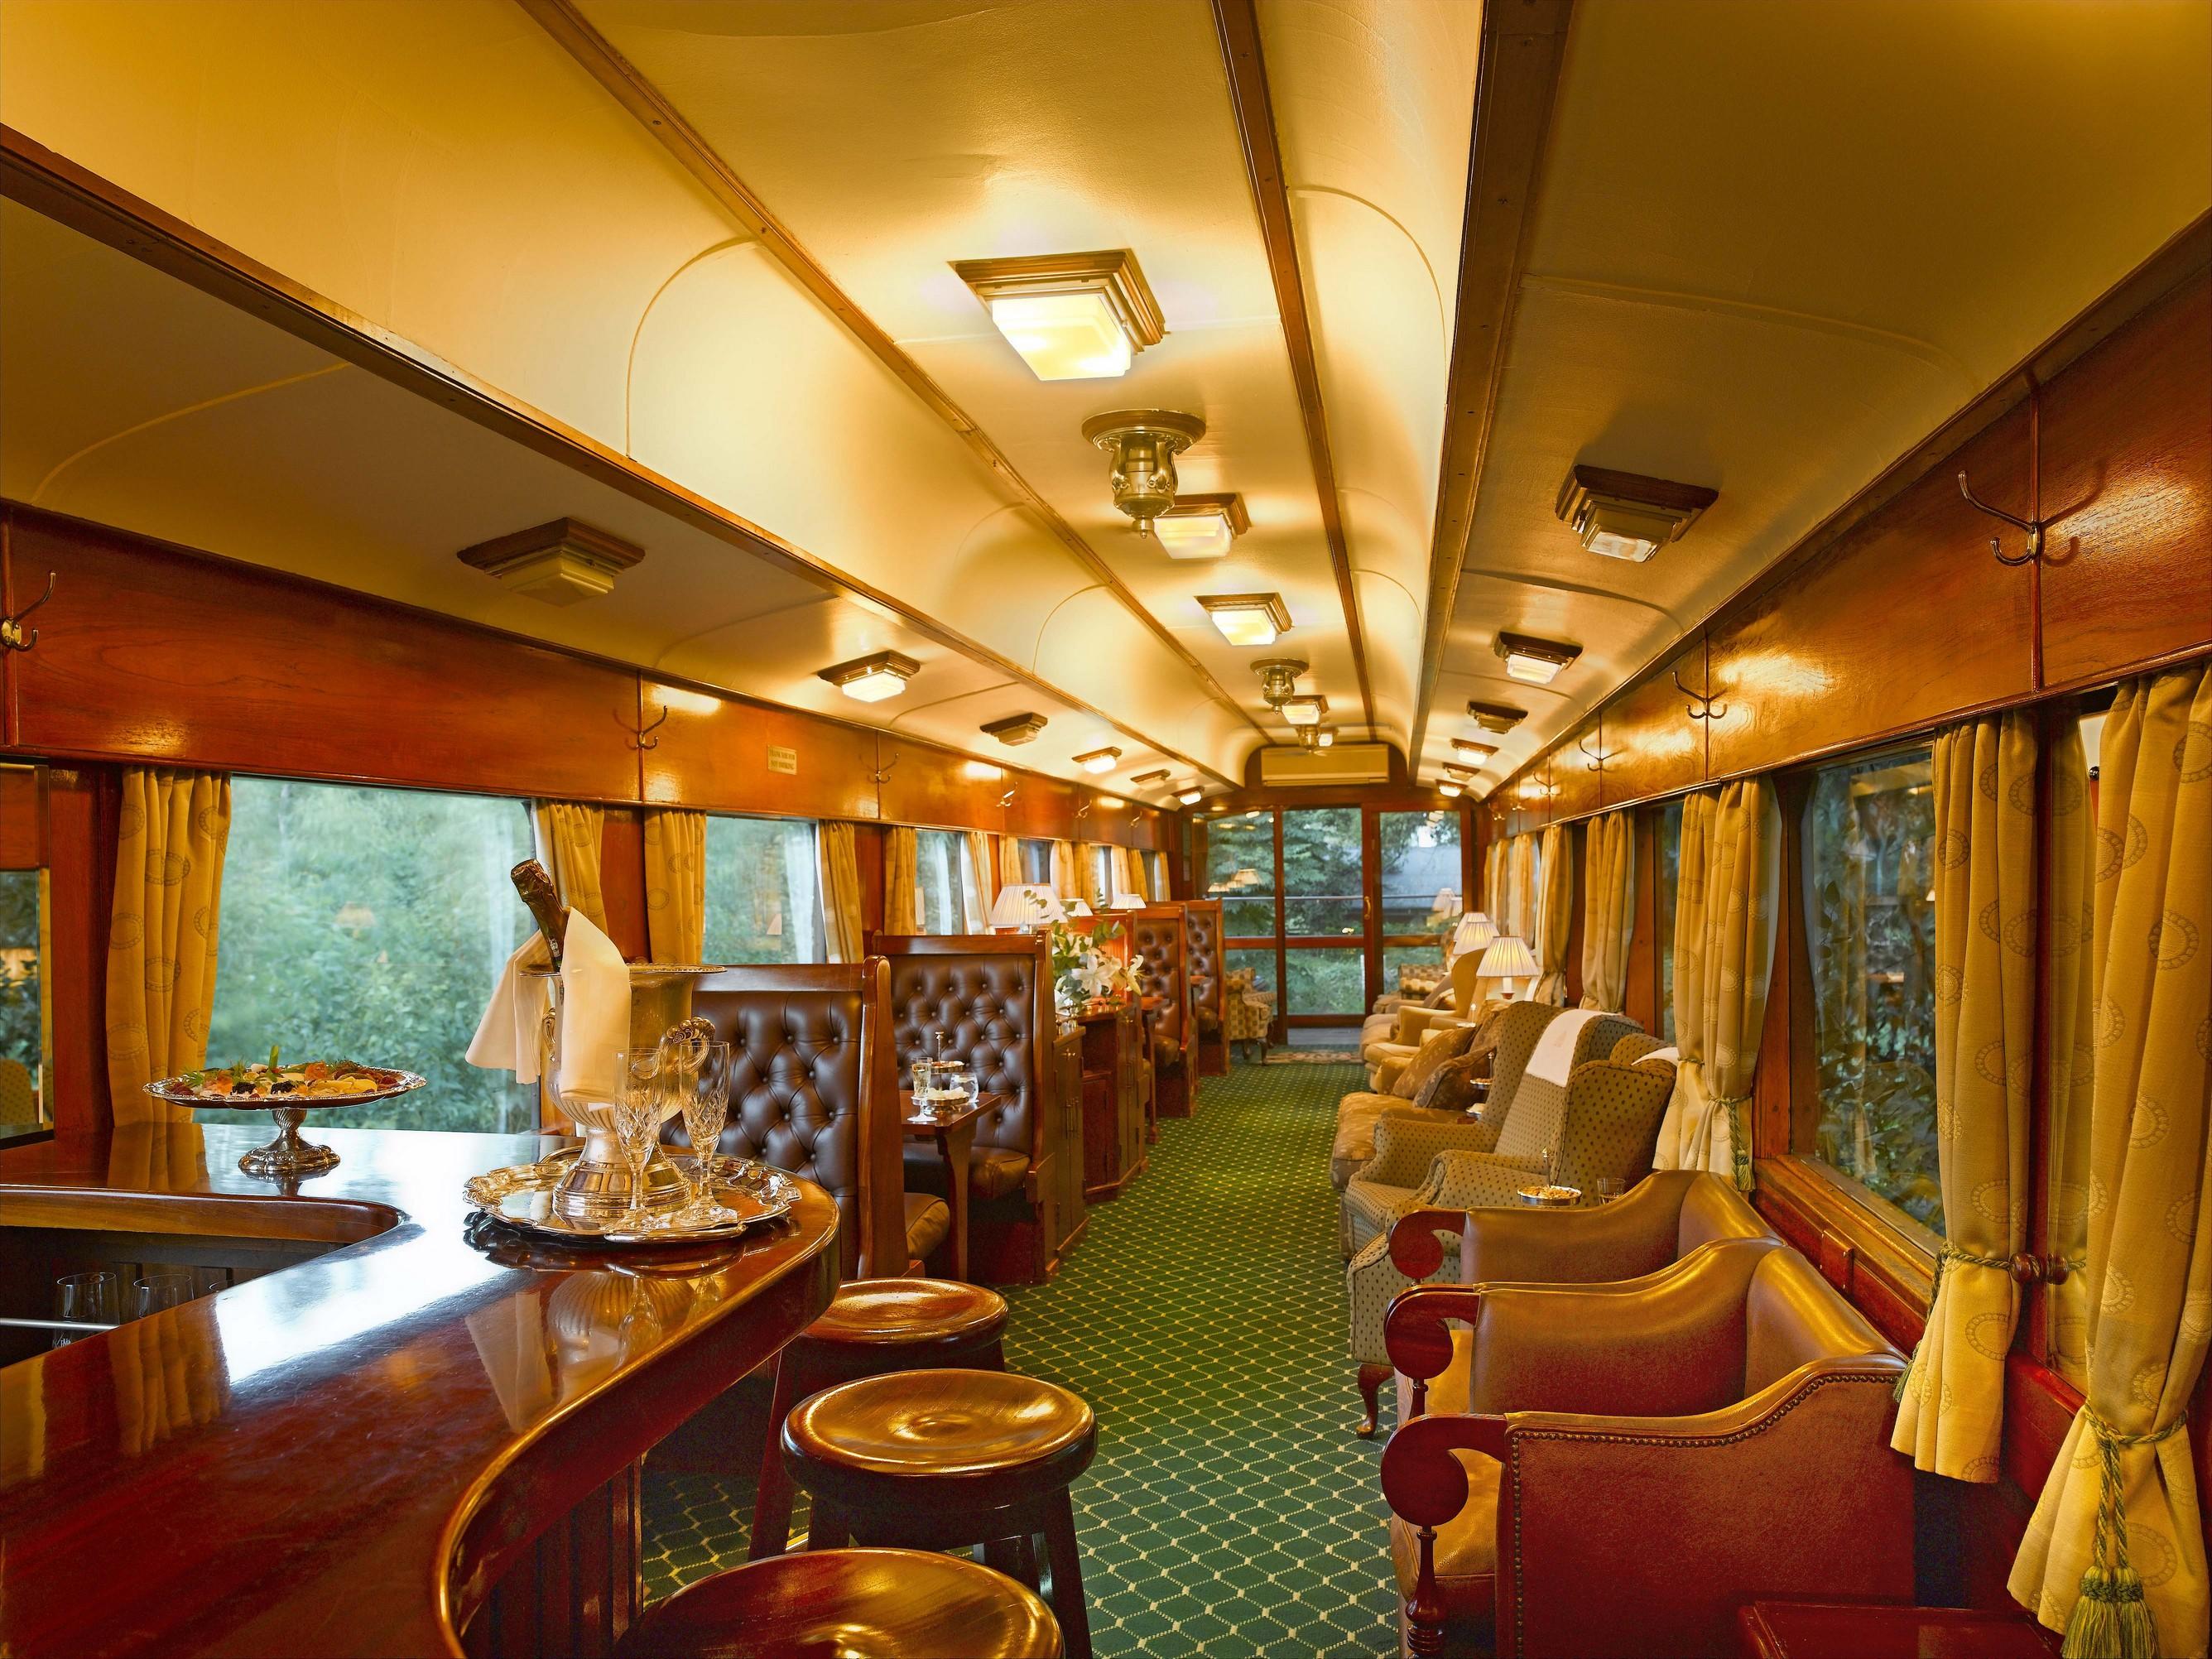 Pullman Compartment Cape Town To Pretoria South Africa